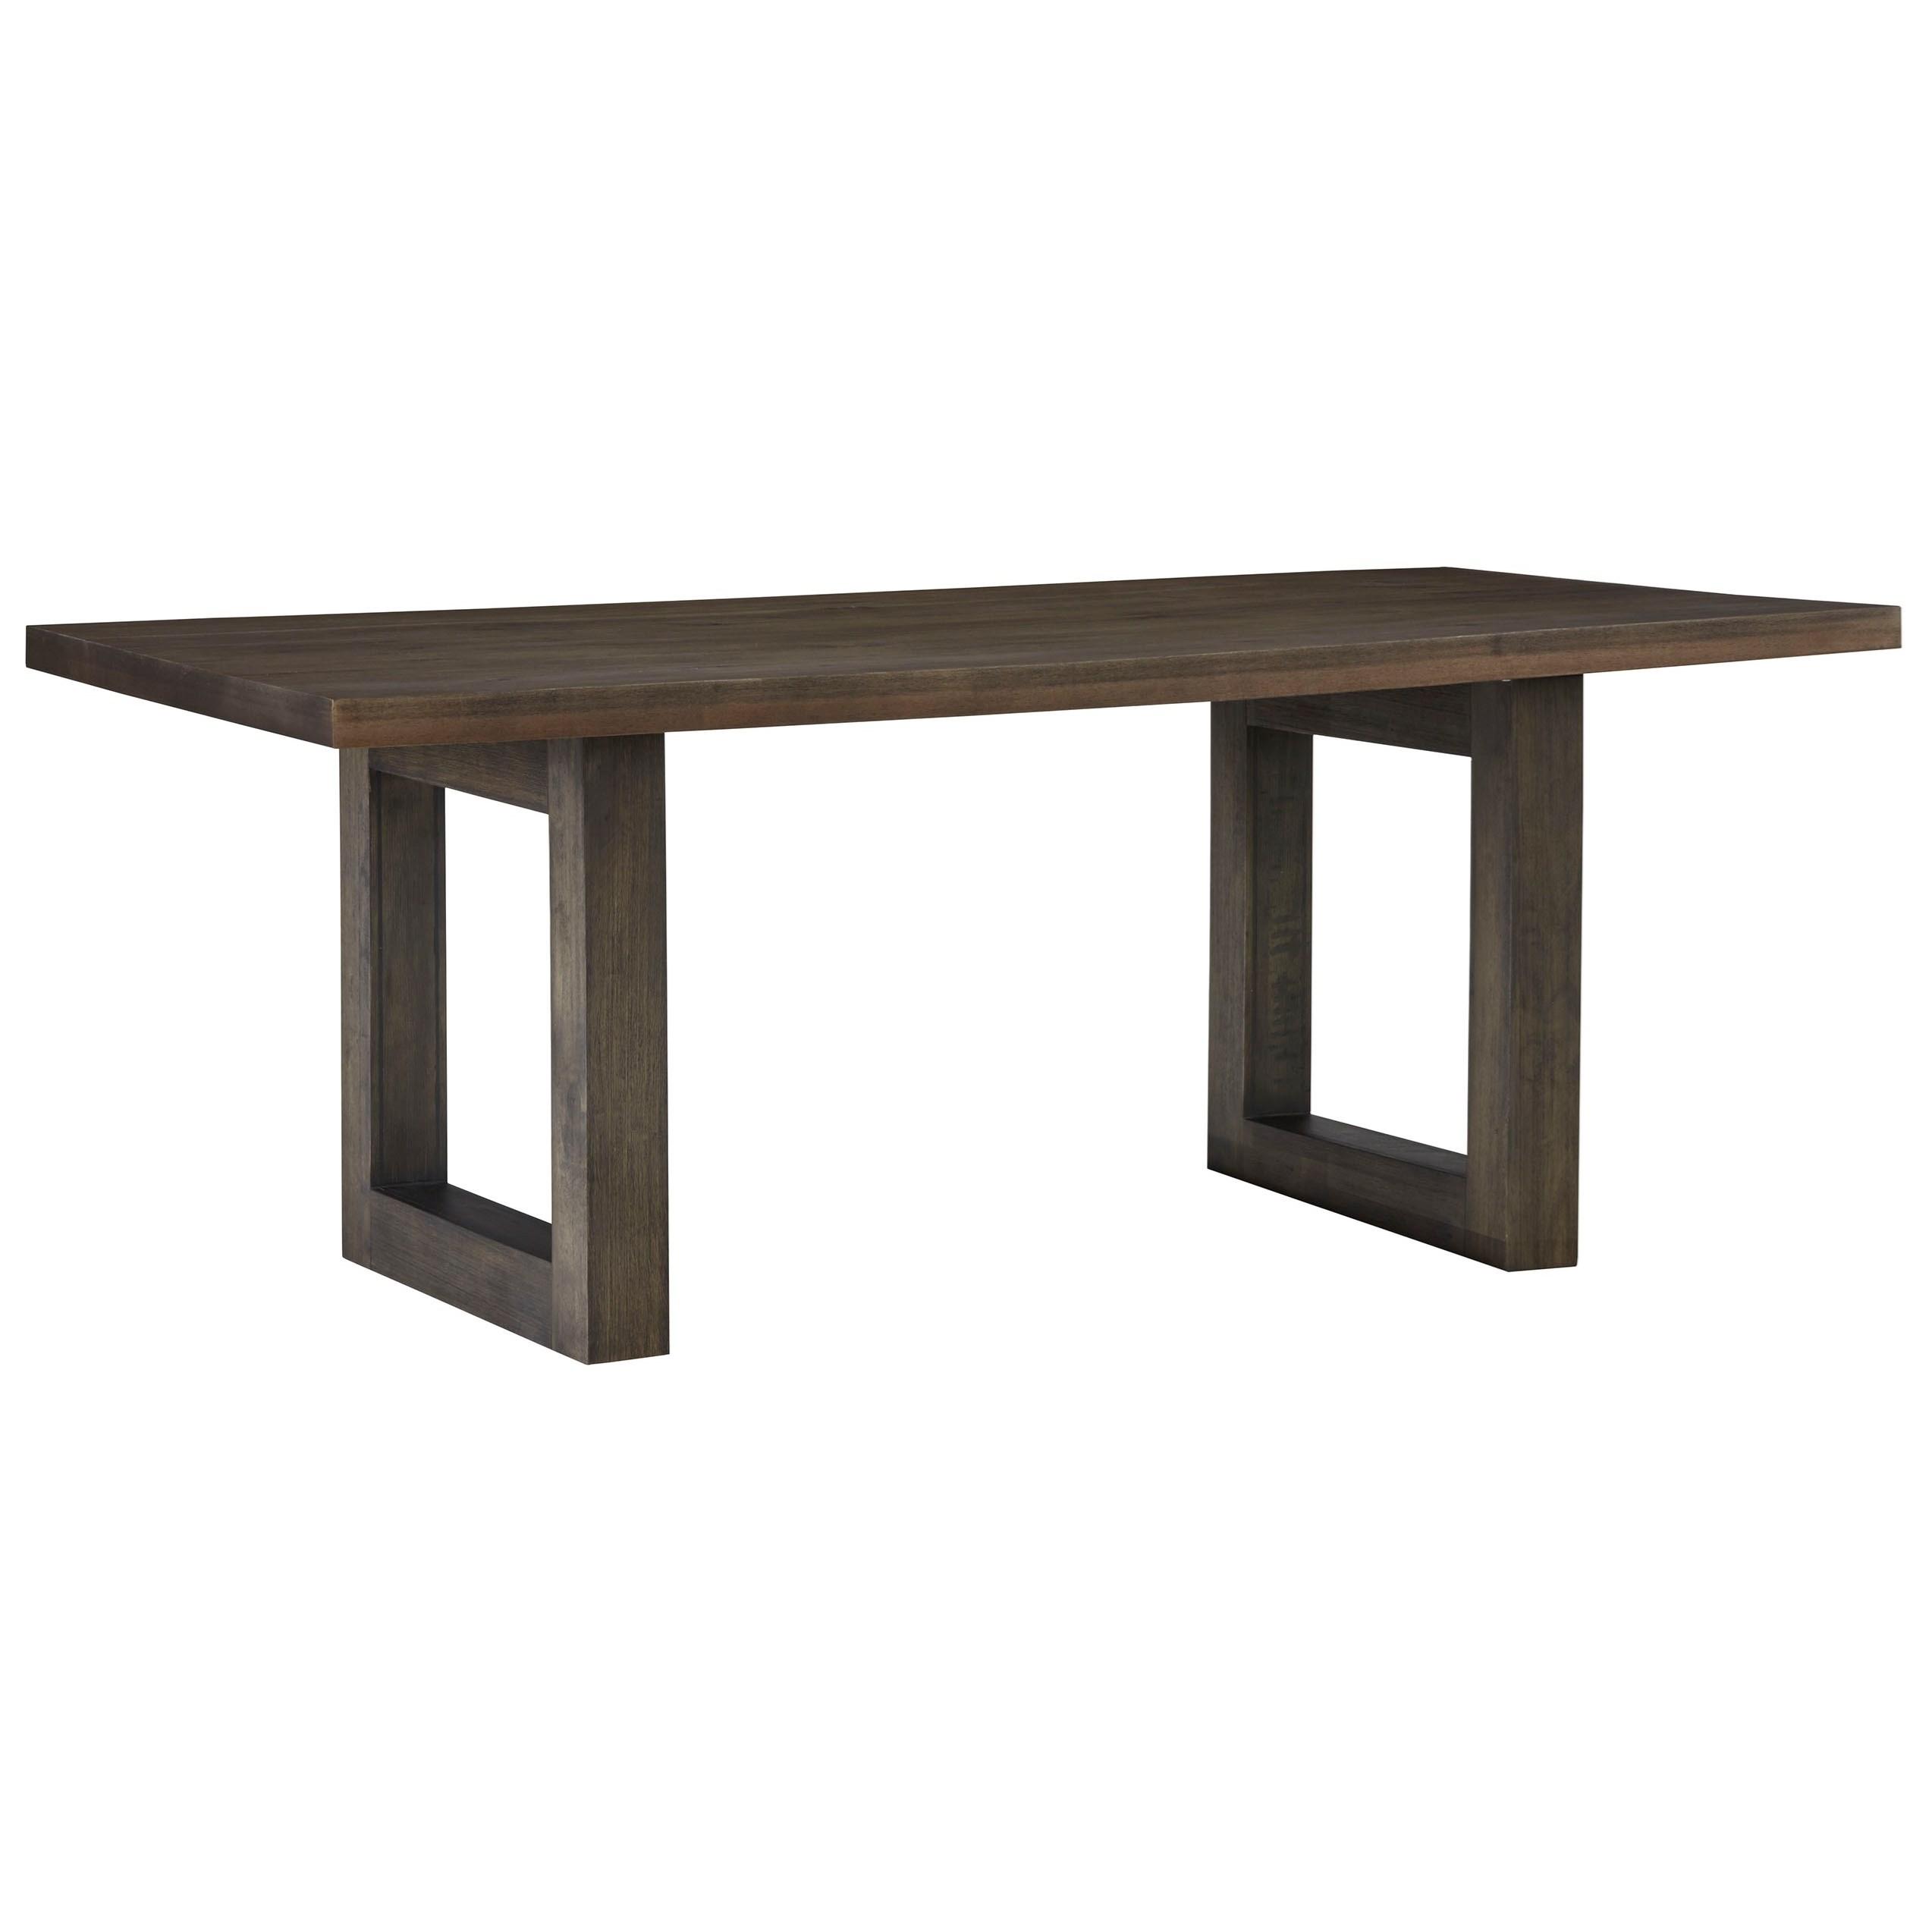 Standard Furniture Trenton Table,Trestle   Item Number: 19401